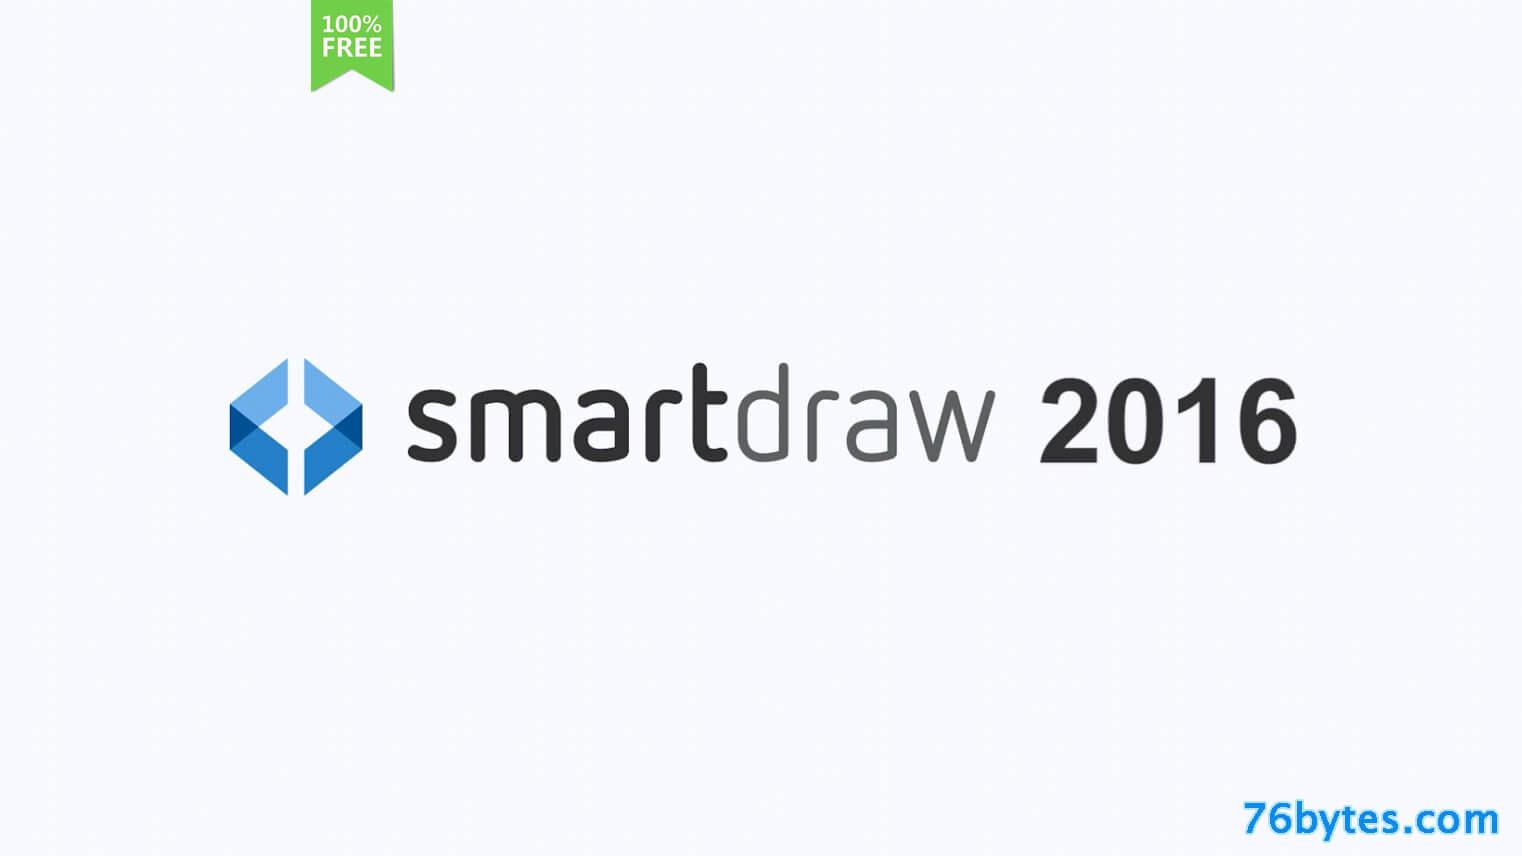 Smartdraw Diagram Crack Gratis FREE Full Version